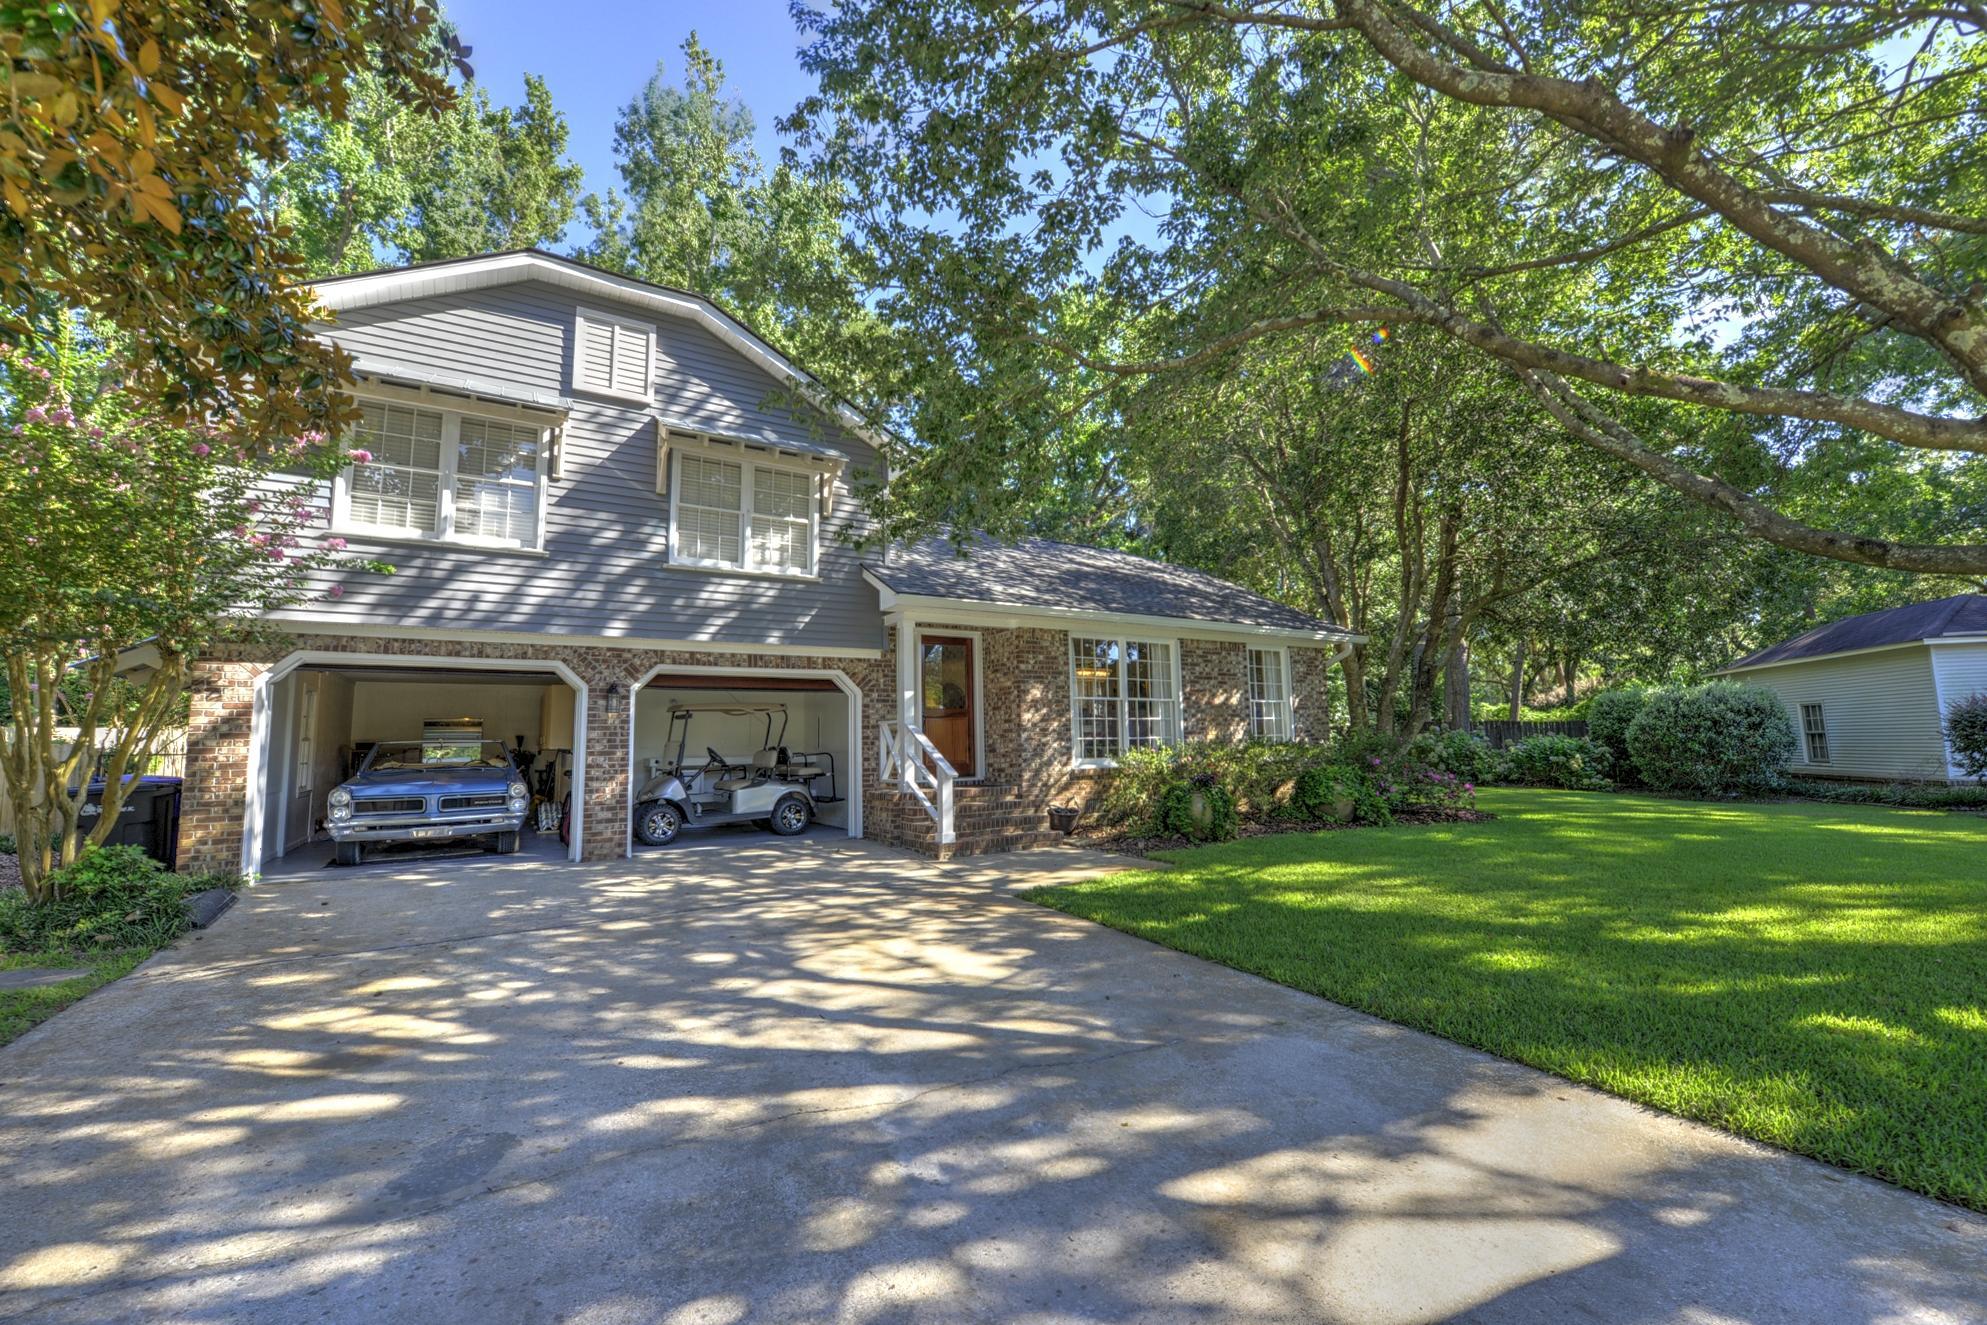 Shemwood II Homes For Sale - 1017 Jack Snipe, Mount Pleasant, SC - 24